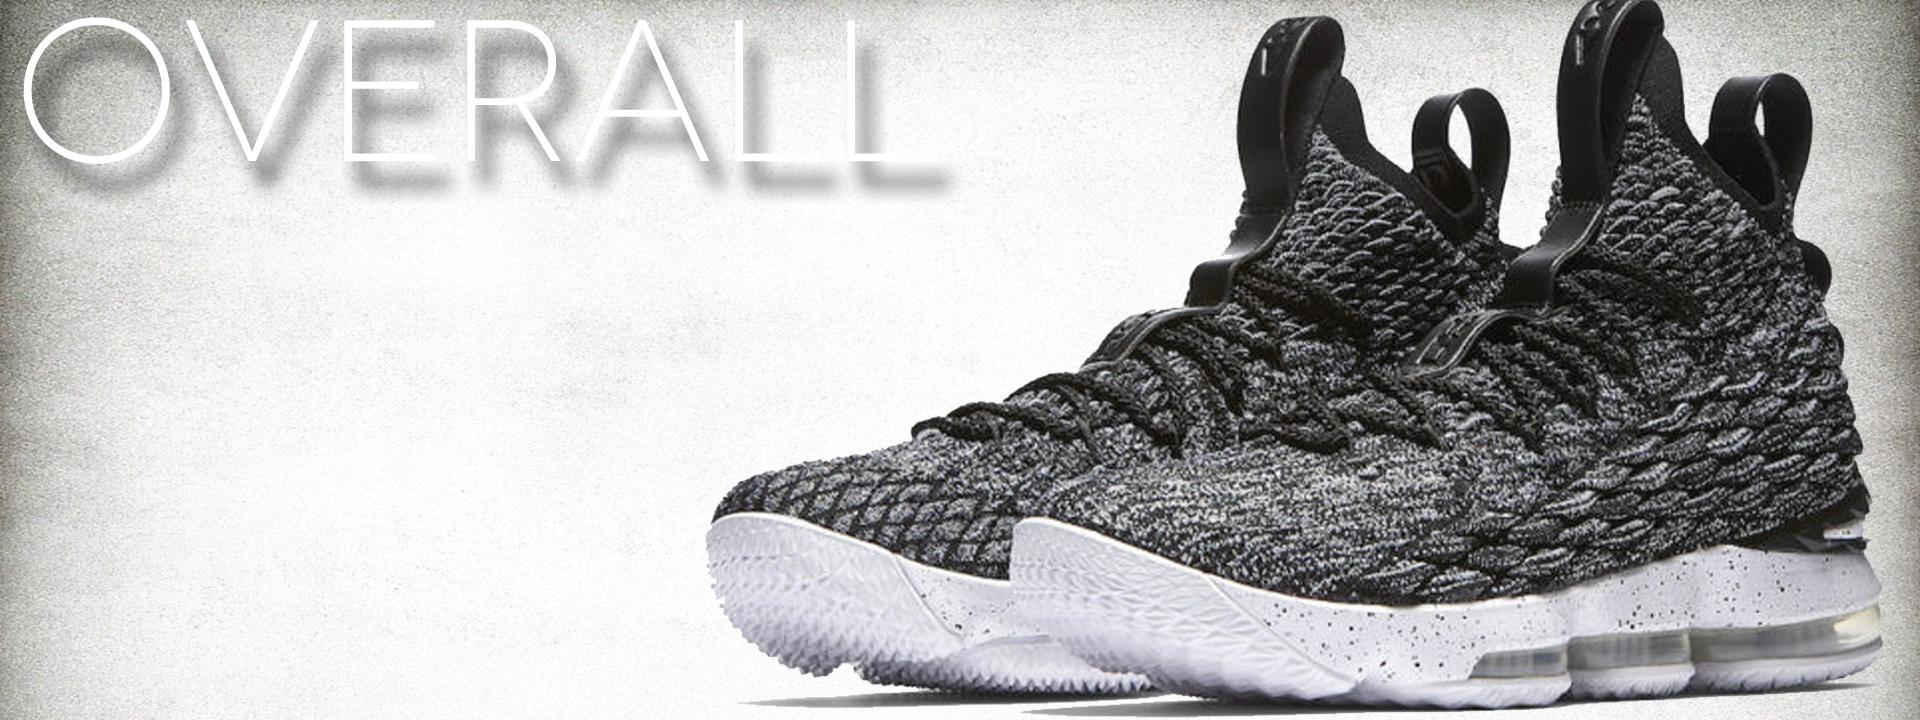 9fc51c52d9a Nike Lebron XV 15 EP Ashes Oreo Black White James Men s Basketball Shoes